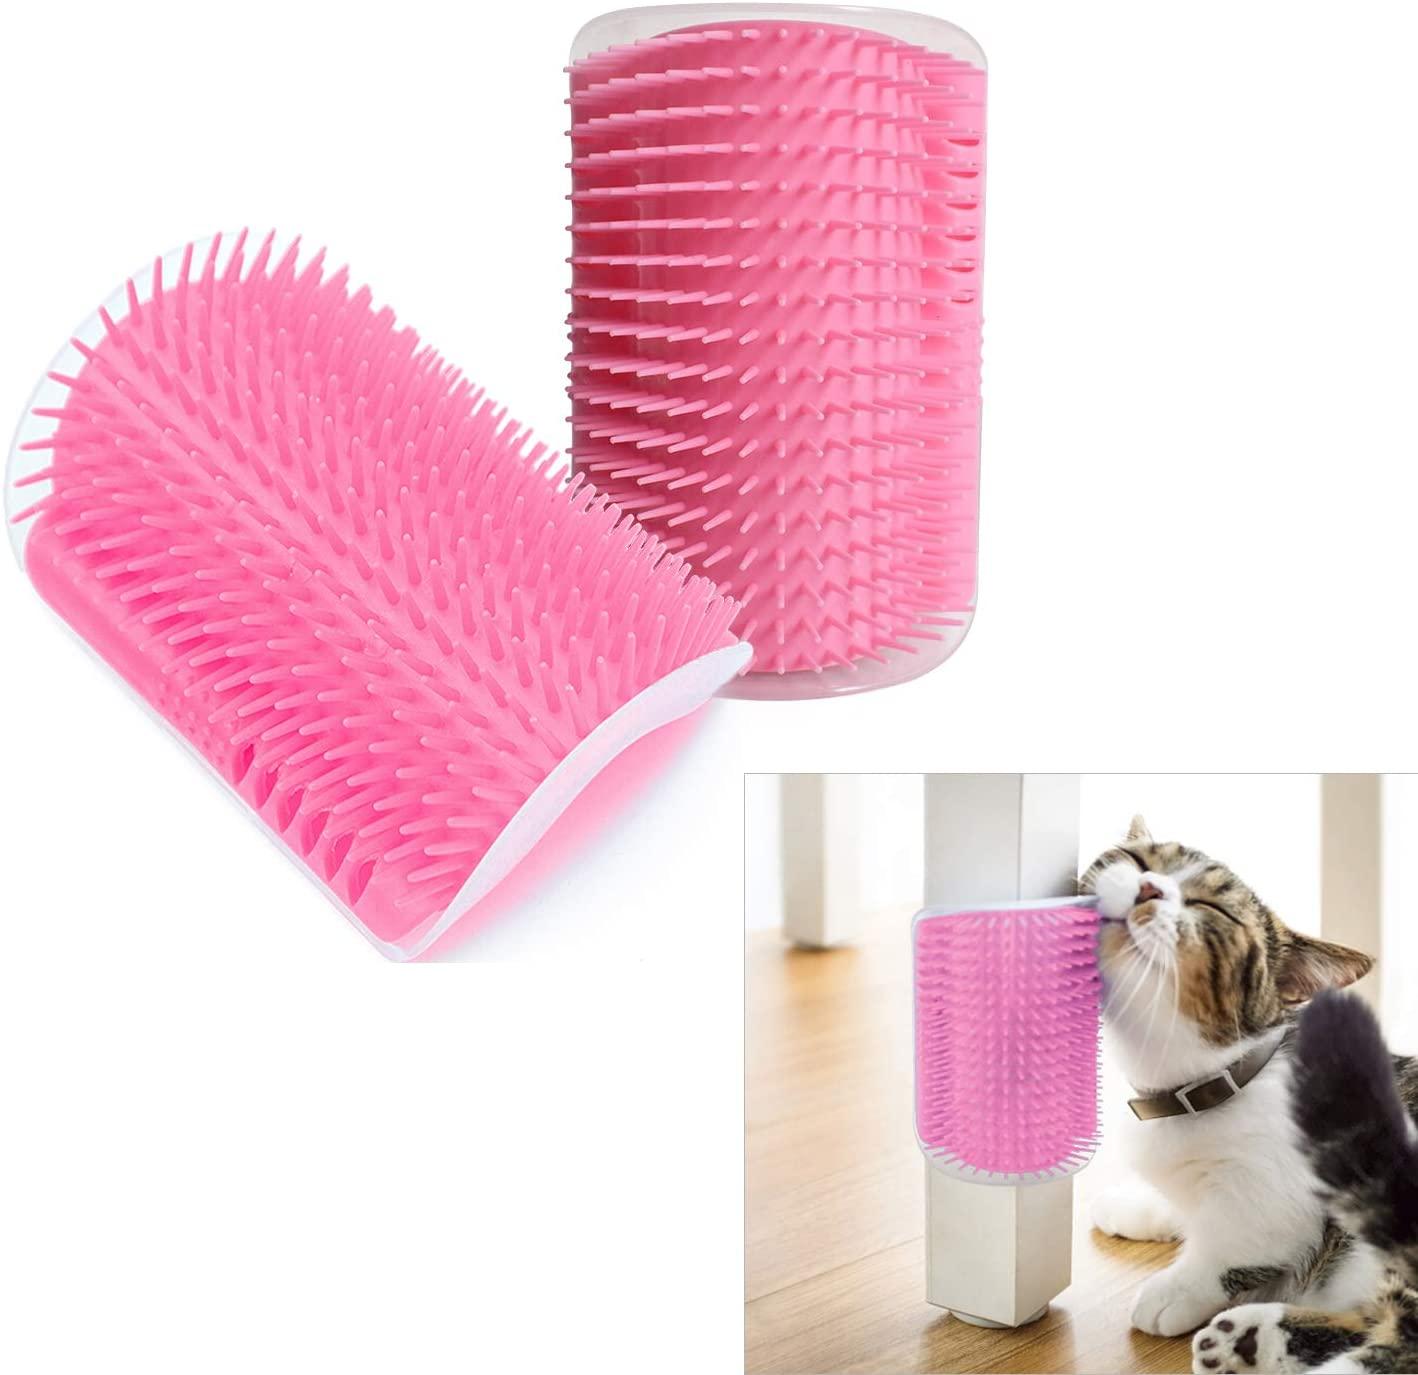 Hub's Gadget 2 Pack Cat Self Groomer, Wall Corner Massage Comb Grooming Brush